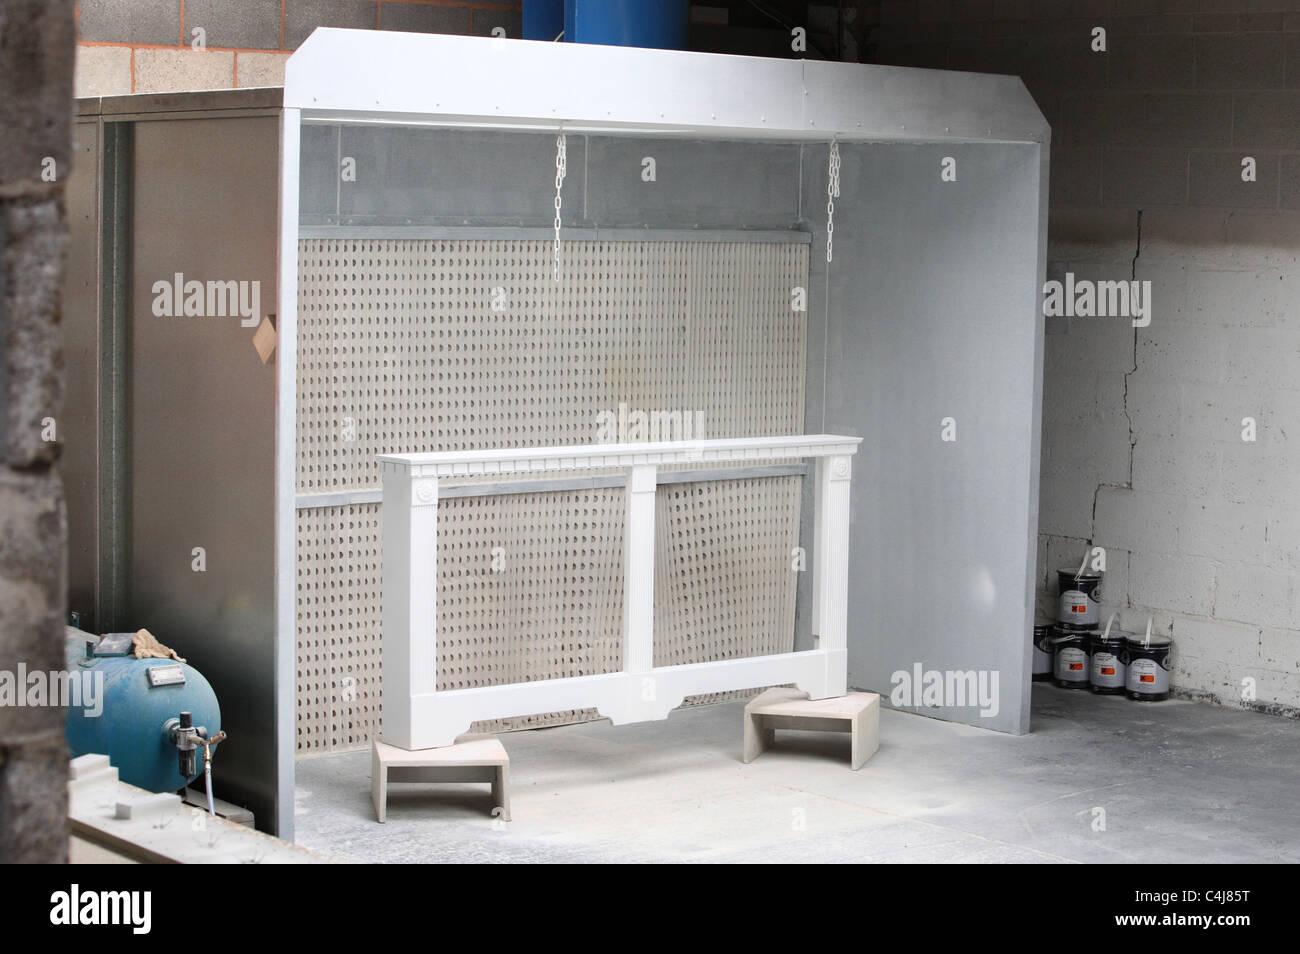 Sprühfarbe Stand in einer Fabrik Stockfoto, Bild: 37280932 - Alamy